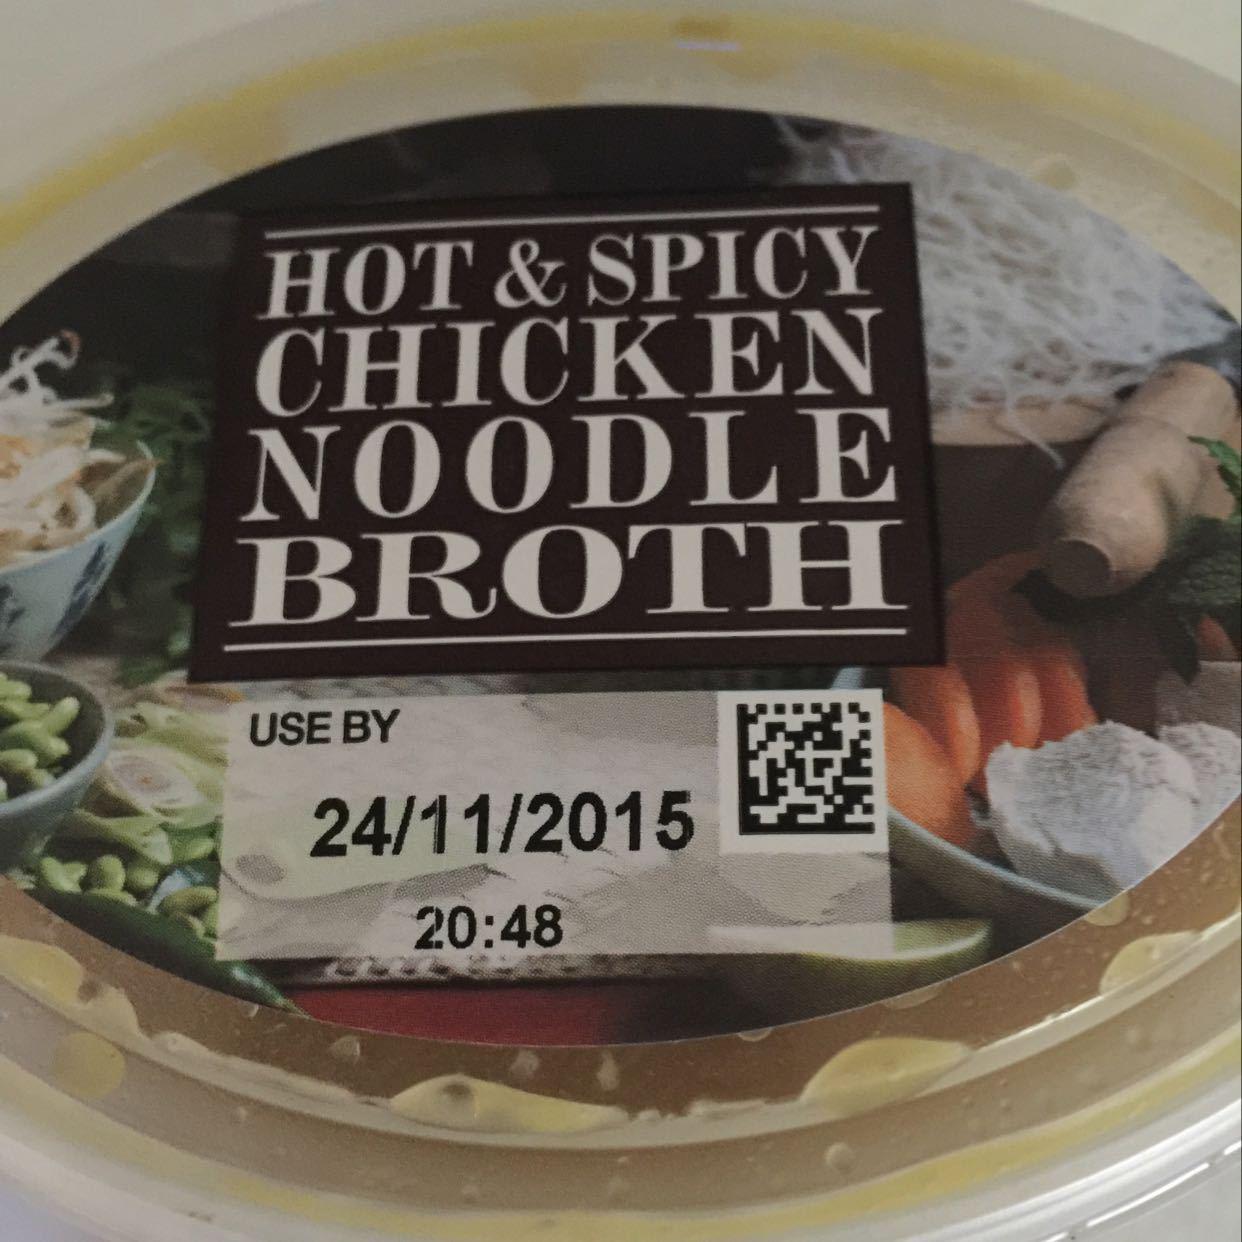 Hot & Spicy Chicken Noodle Broth